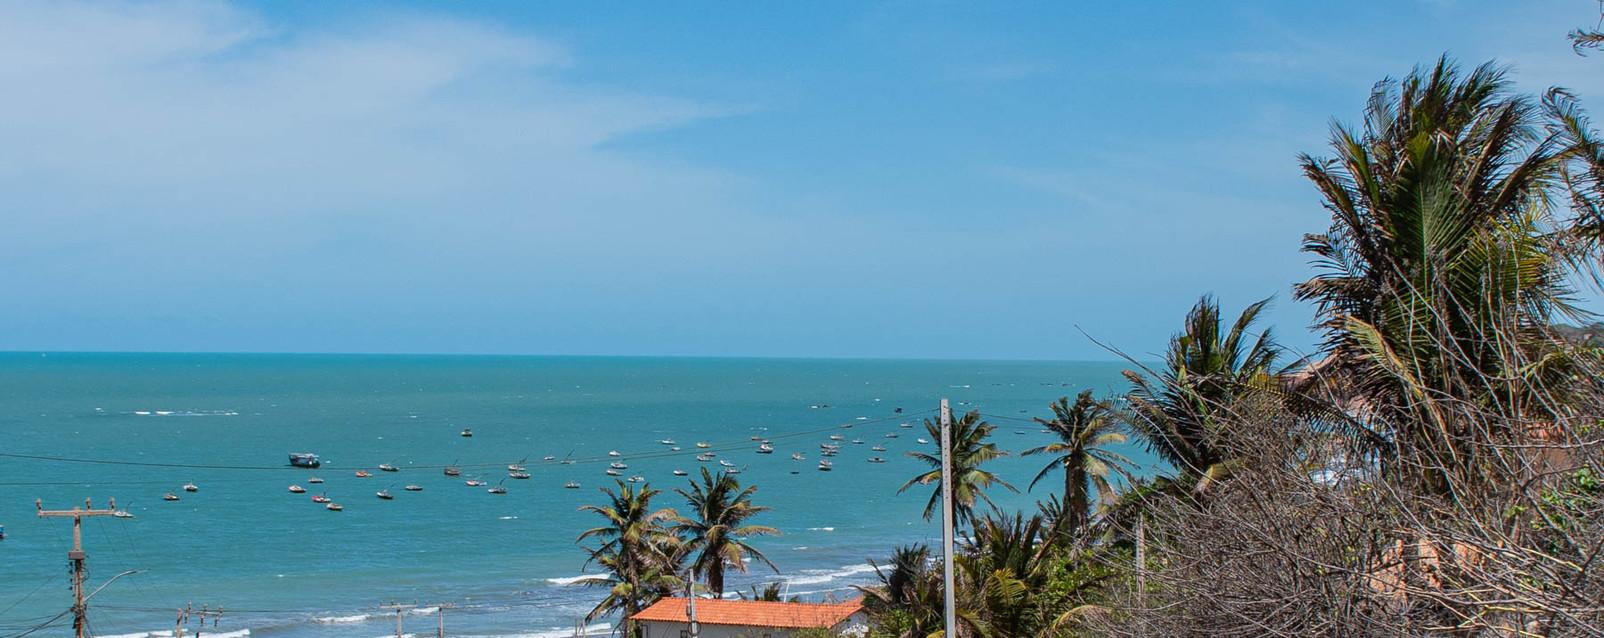 DSC_0795 Ponta Grossa.jpg